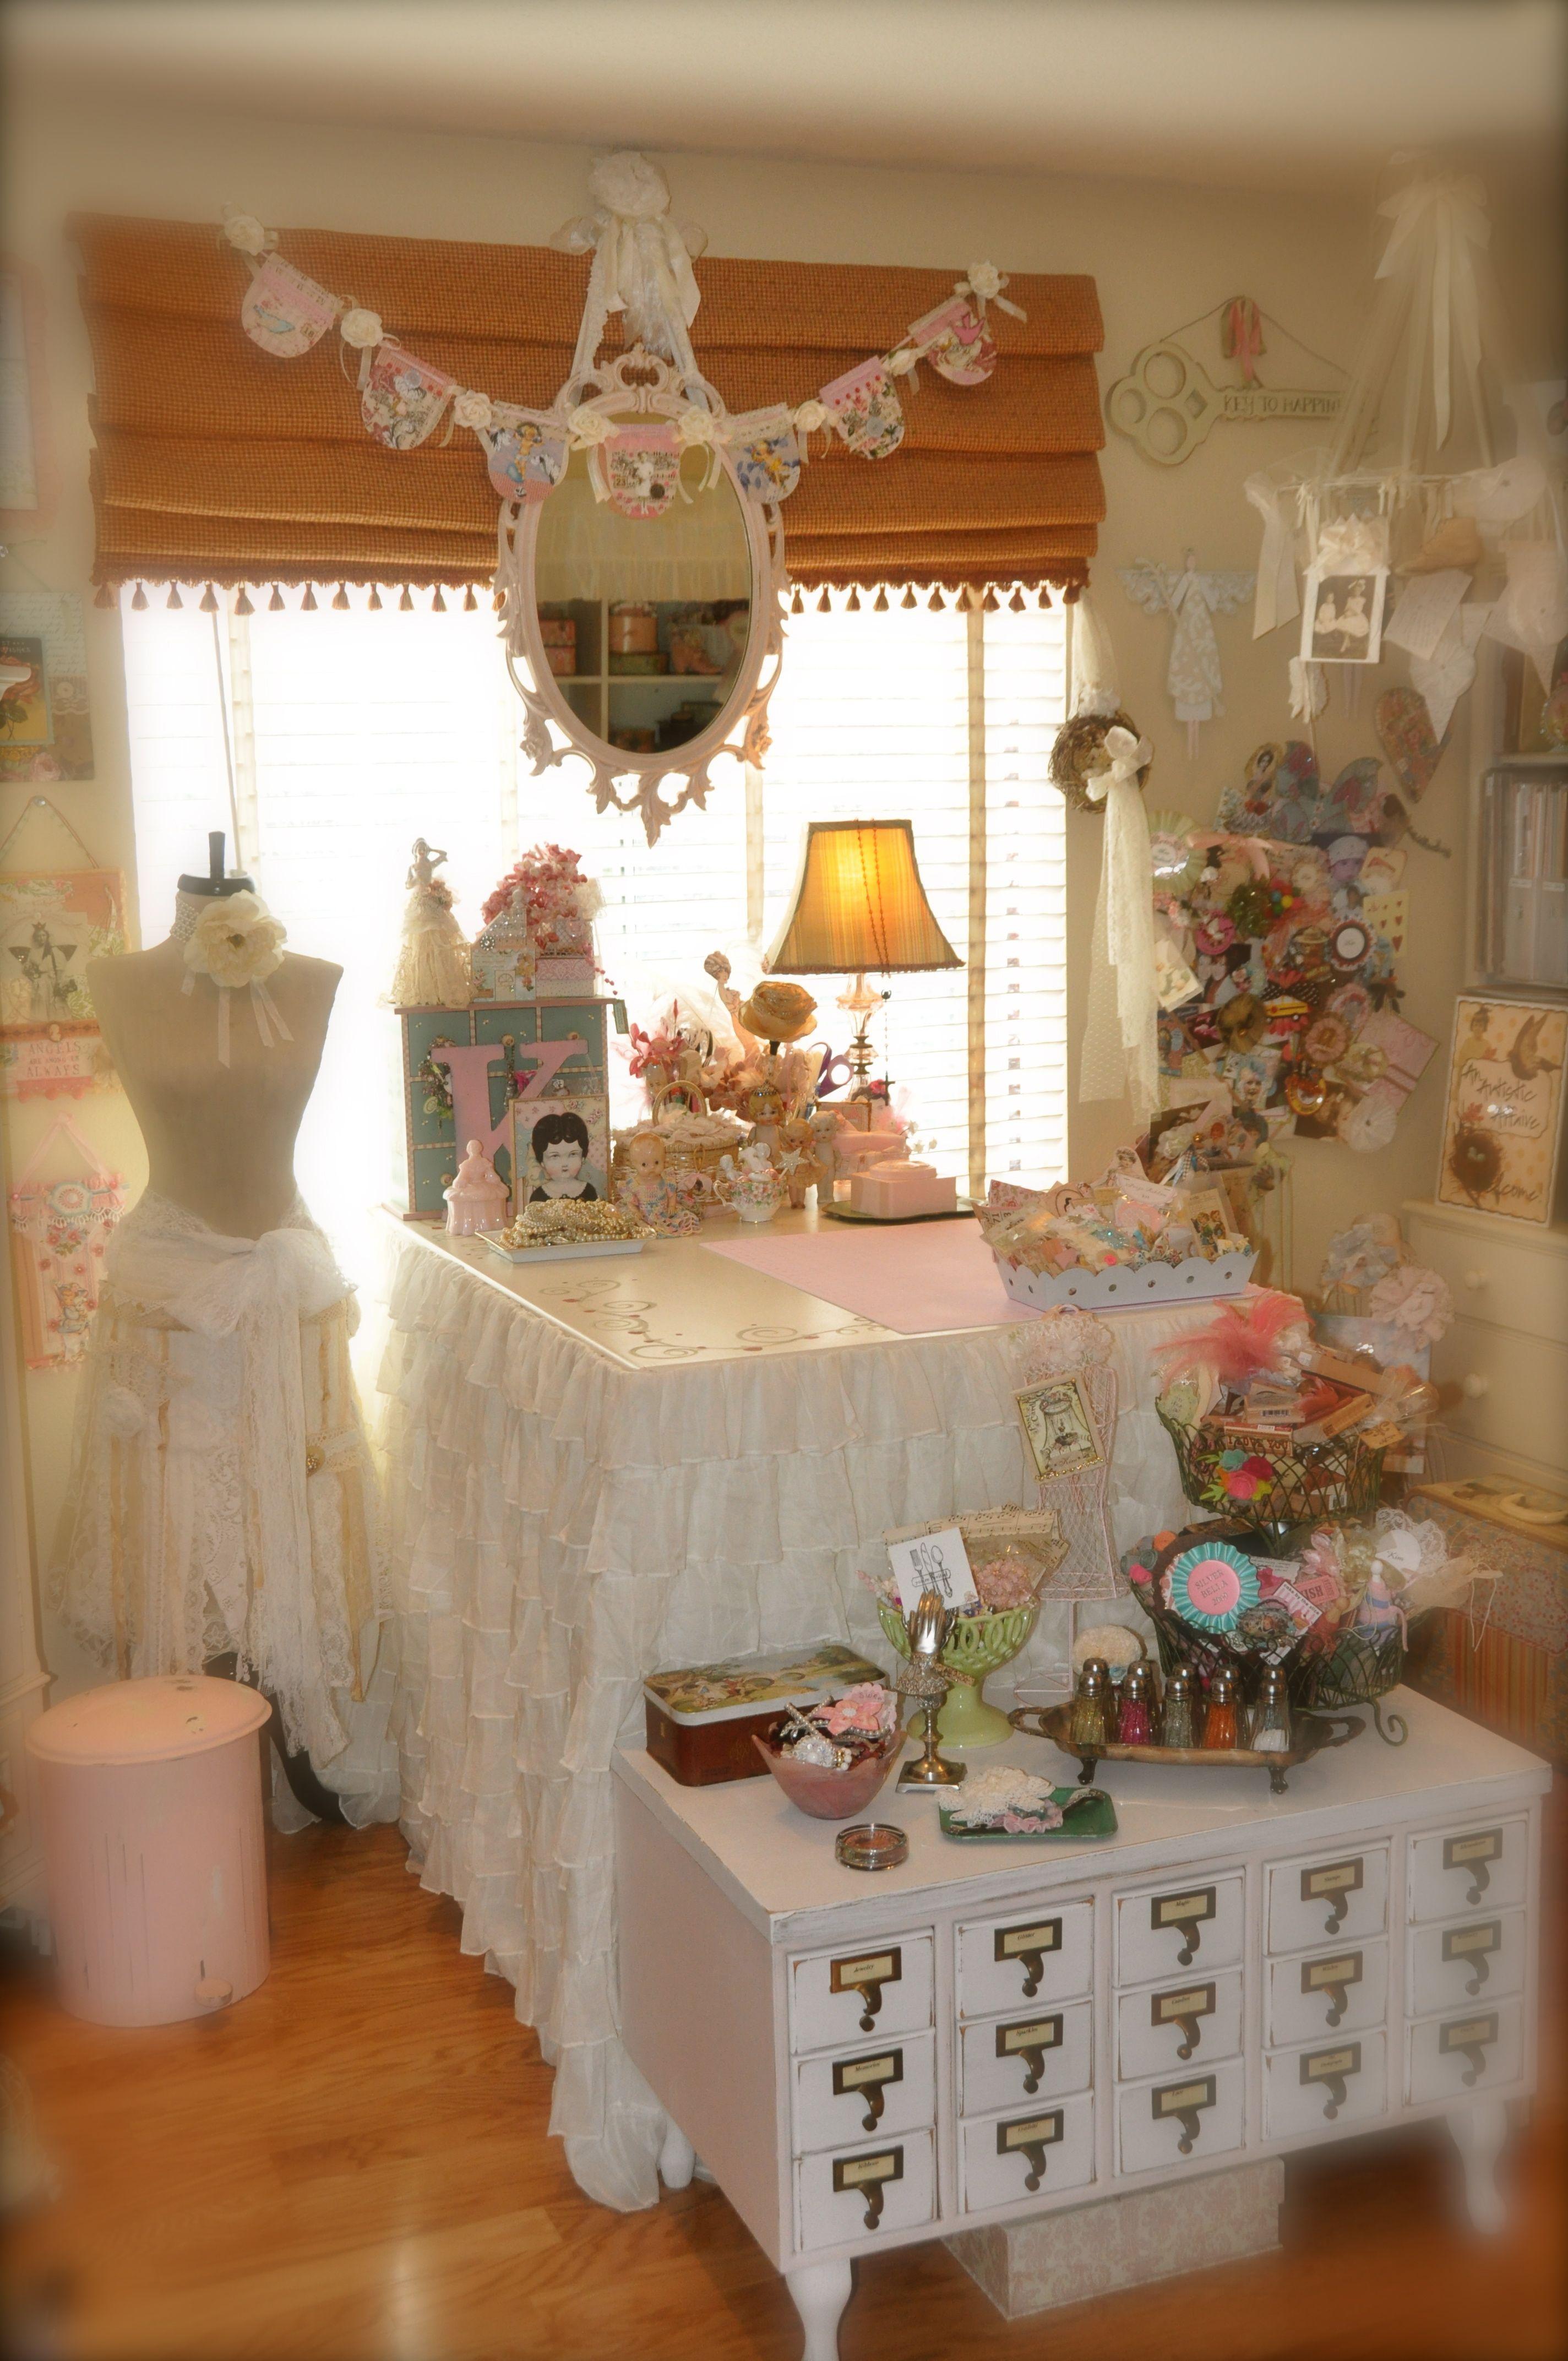 10x10 Room Layout Craft: Kim Caldwell's Craftroom (mit Bildern)